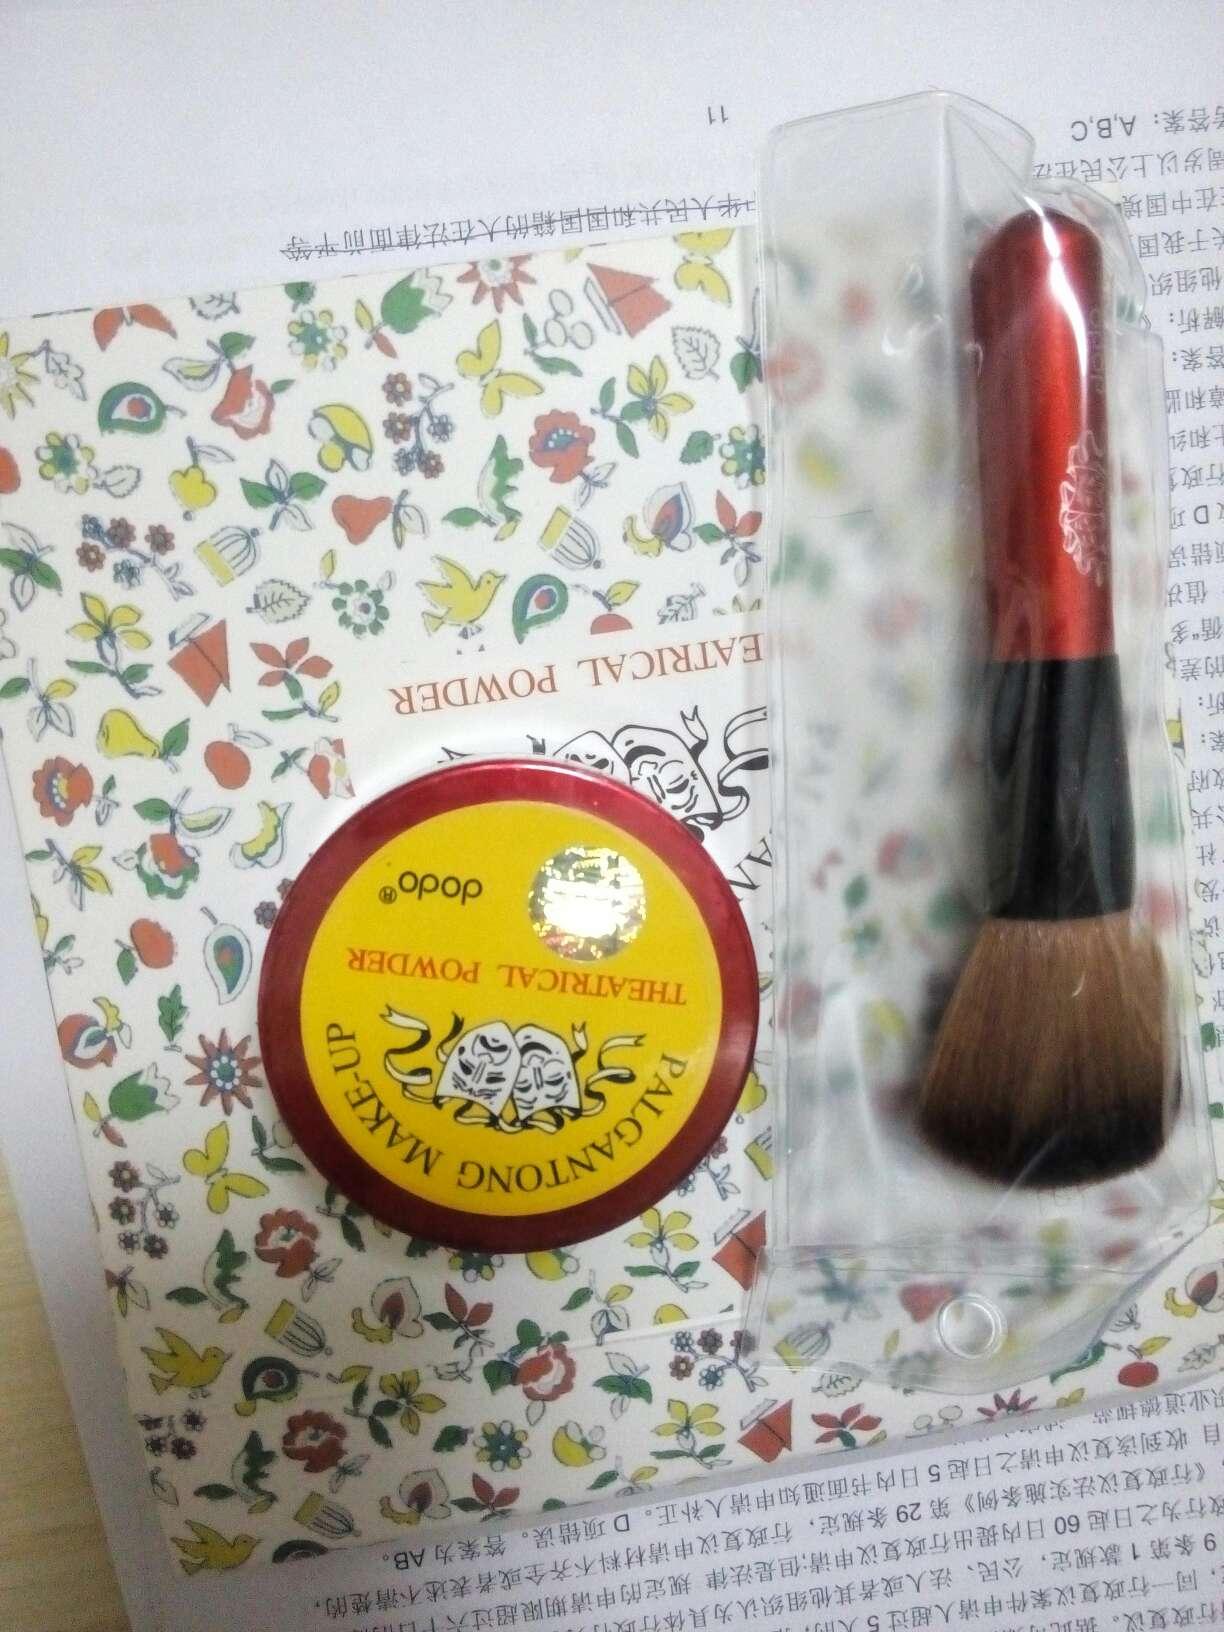 sb janoski red gum 00294847 store